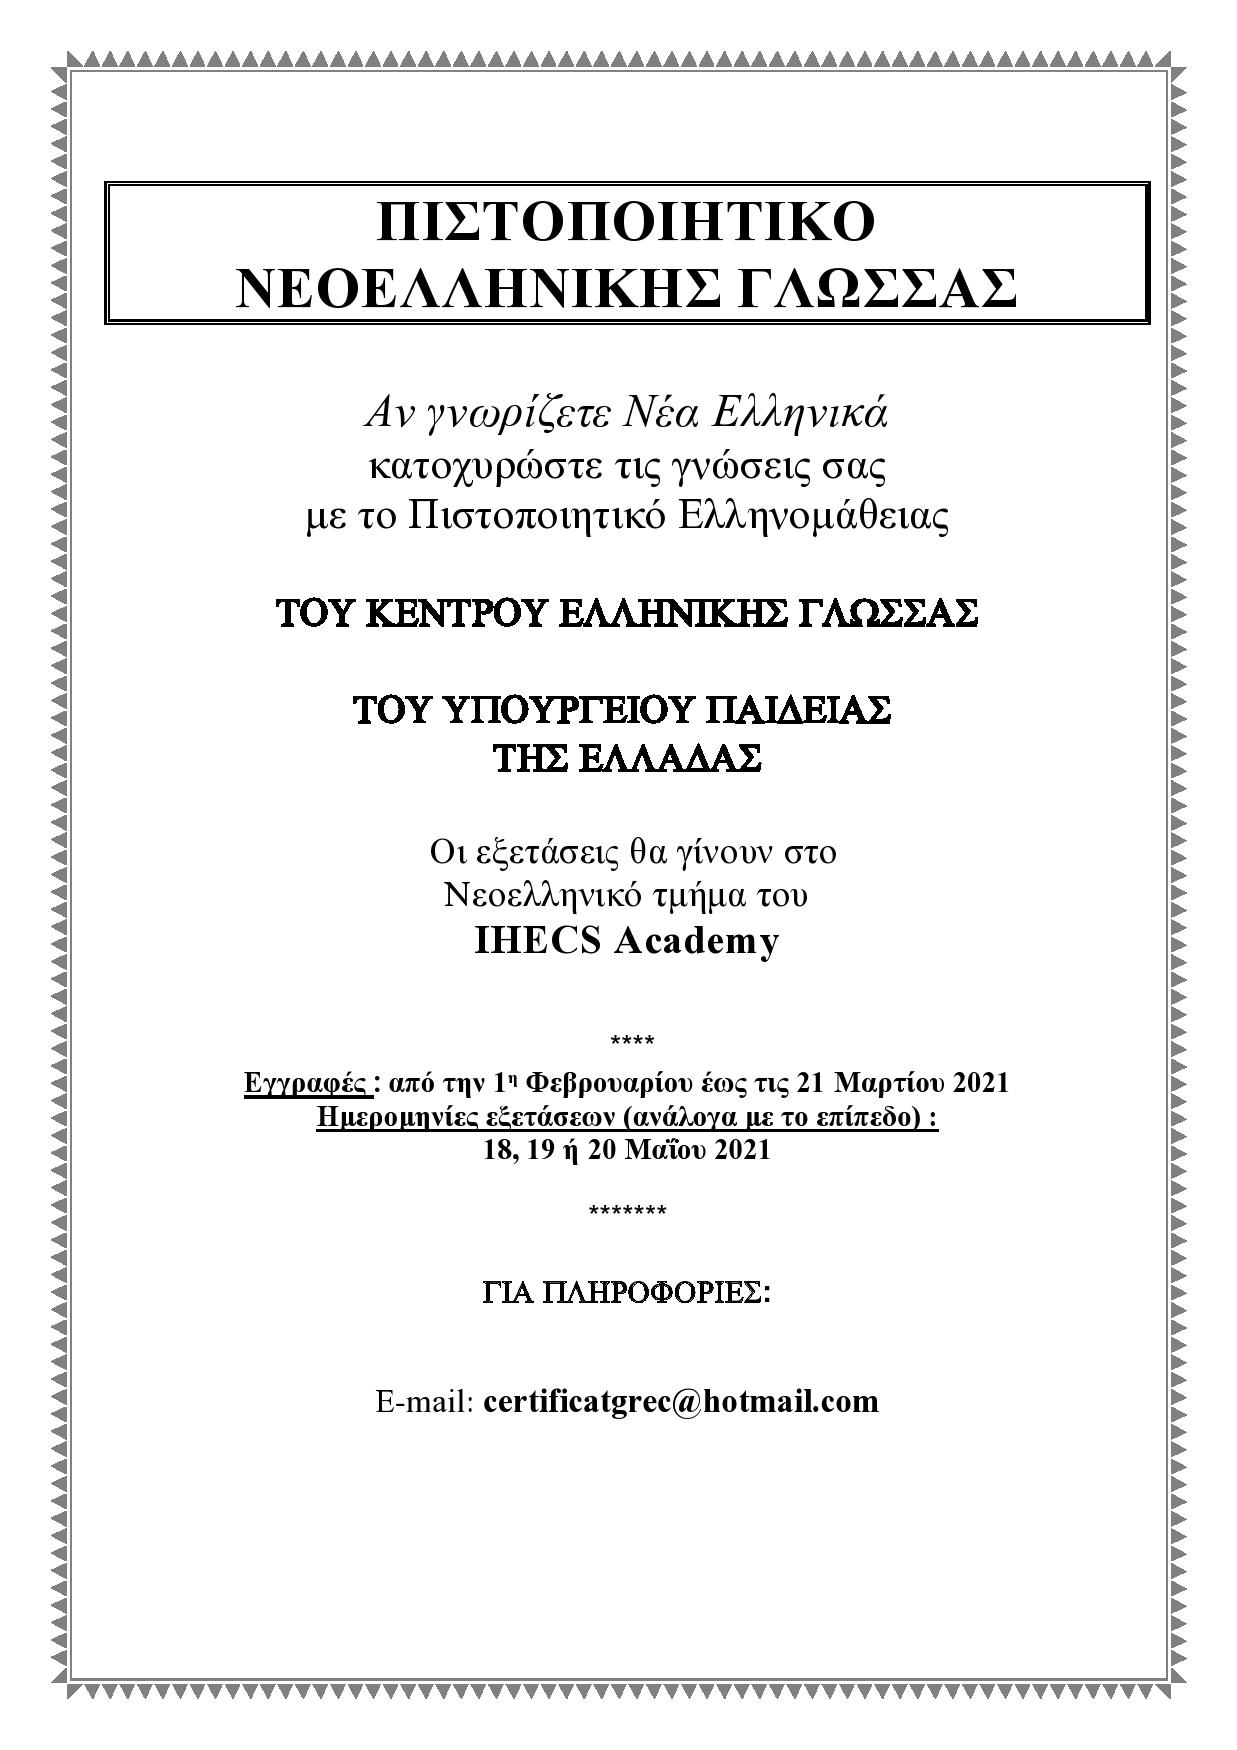 Afichette Certificat Grec 2021-page0001